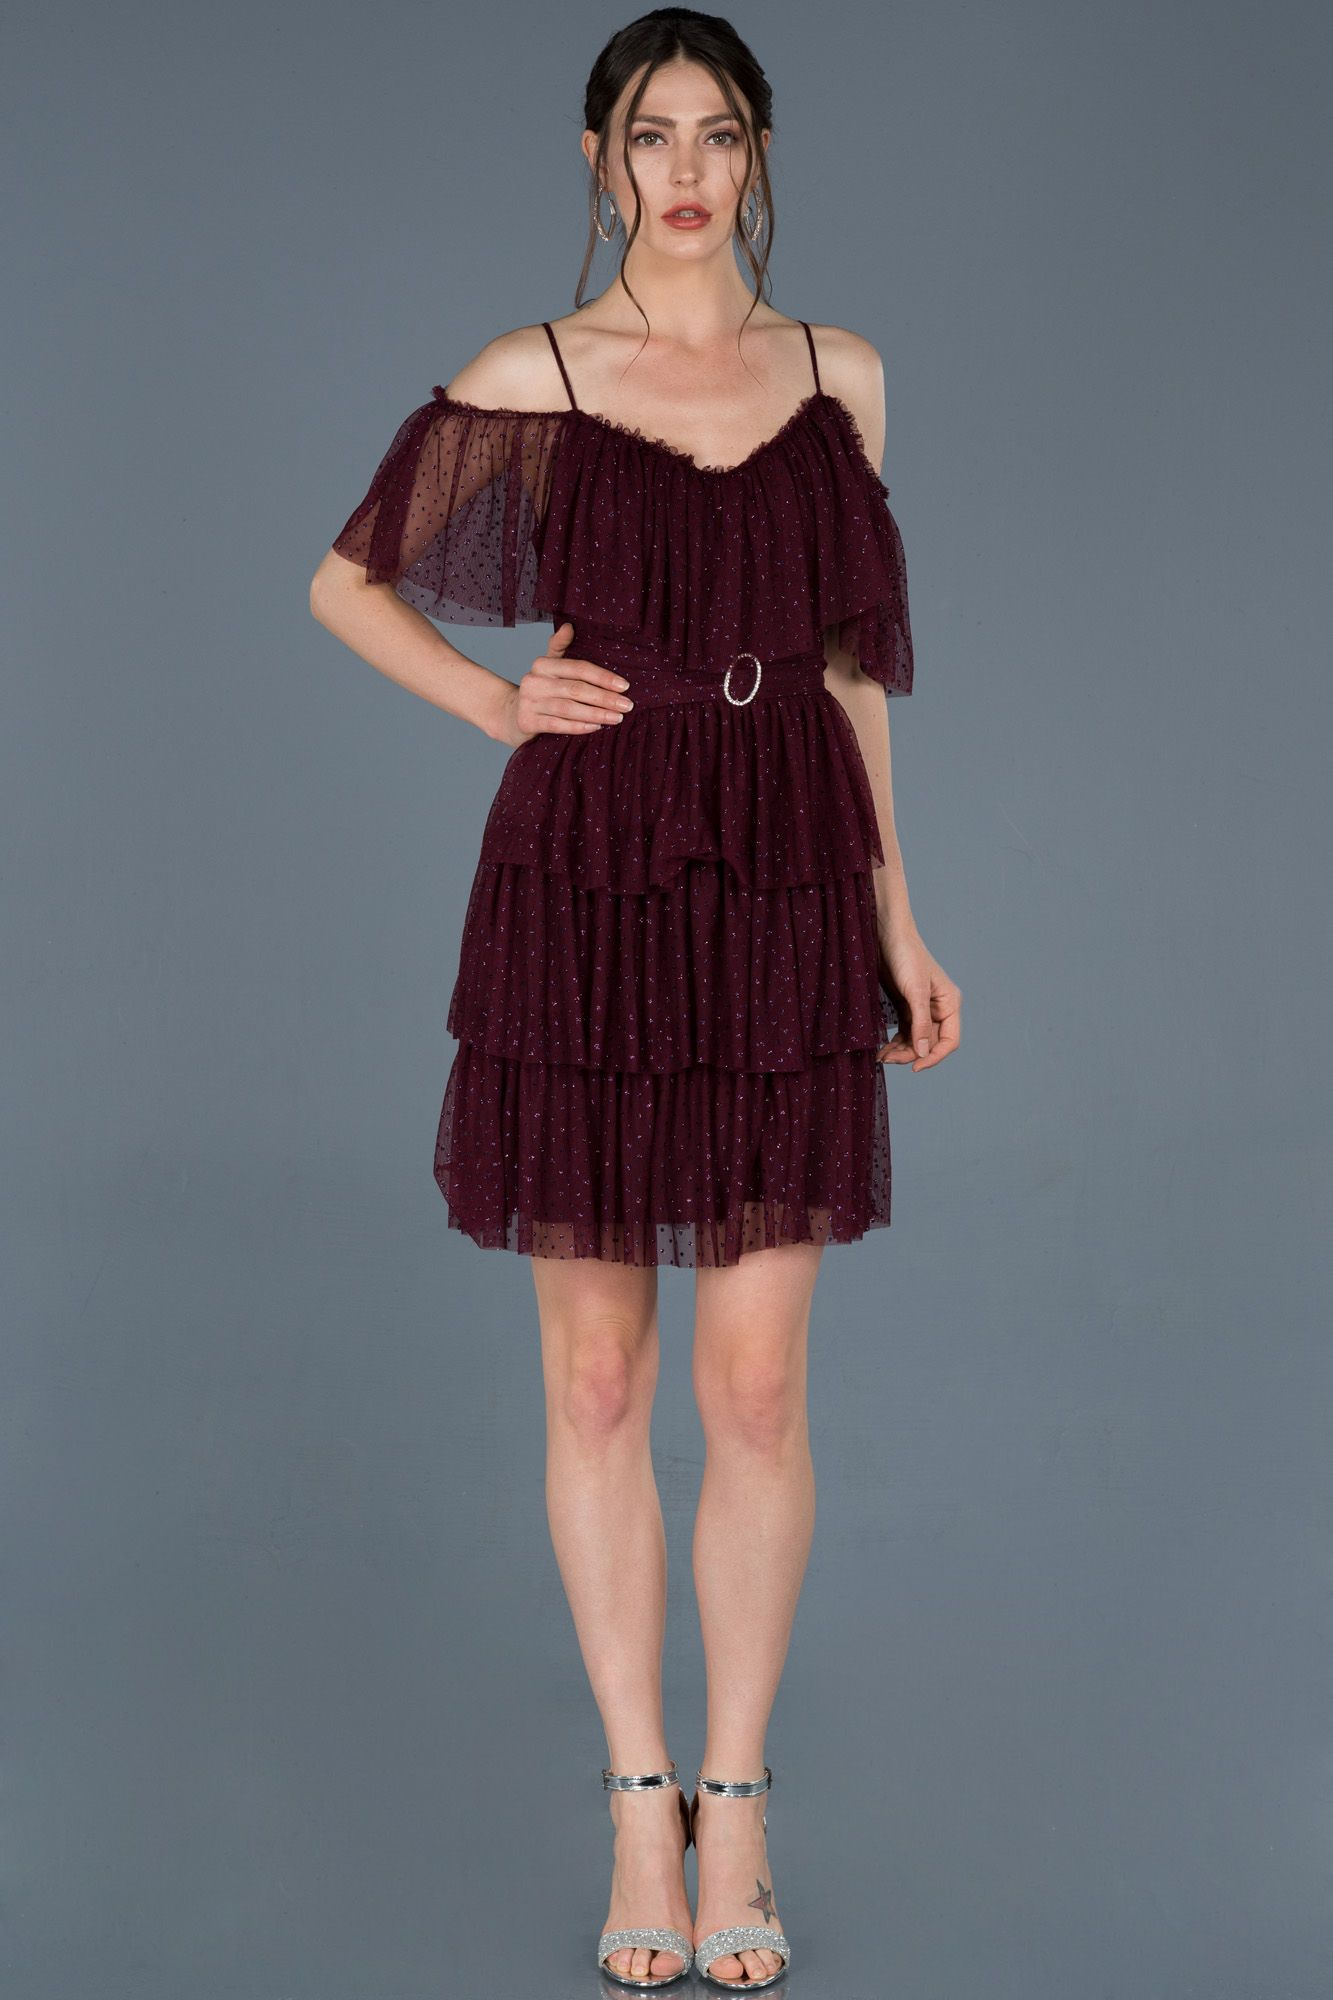 Murdum Askili Mezuniyet Elbisesi Abk413 2020 Mini Elbise Elbise Modelleri Elbise